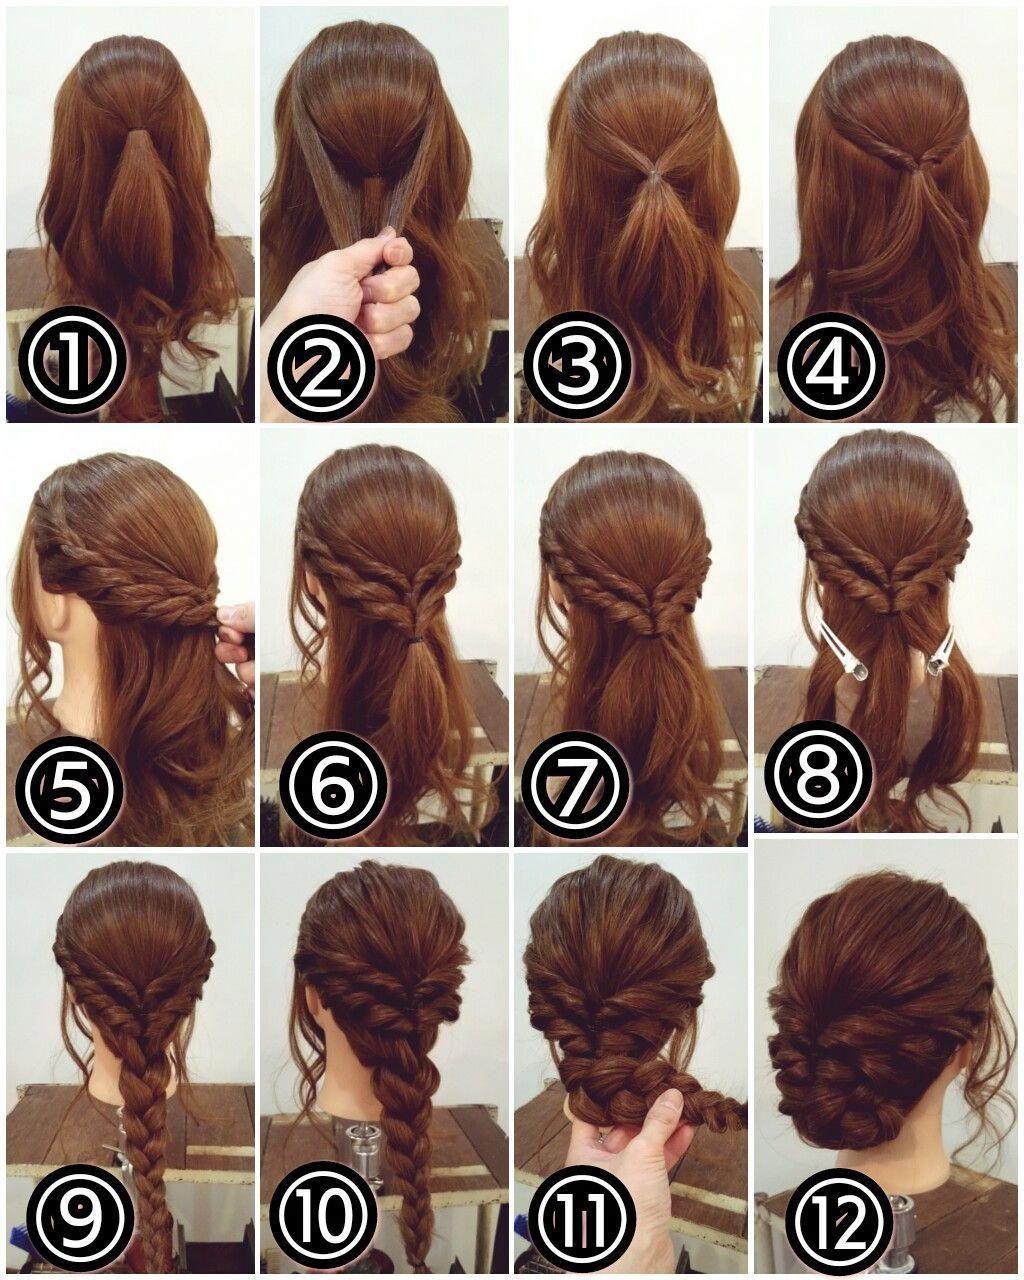 Lange Haare Peinadosartisticos Pinterest Hair Long Hair Styles Hair Updos